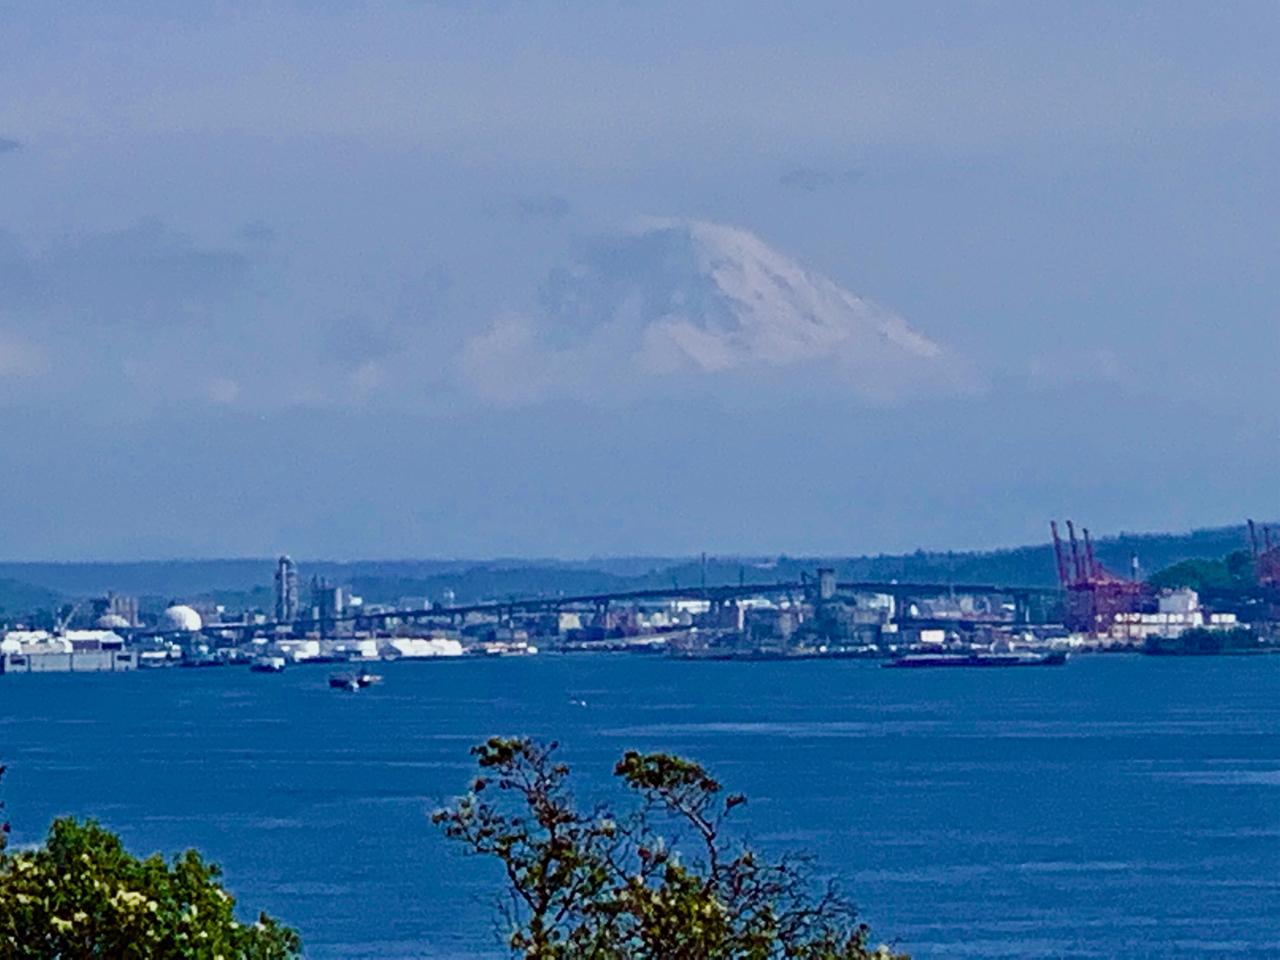 Mount Rainier in the Seattle skyline